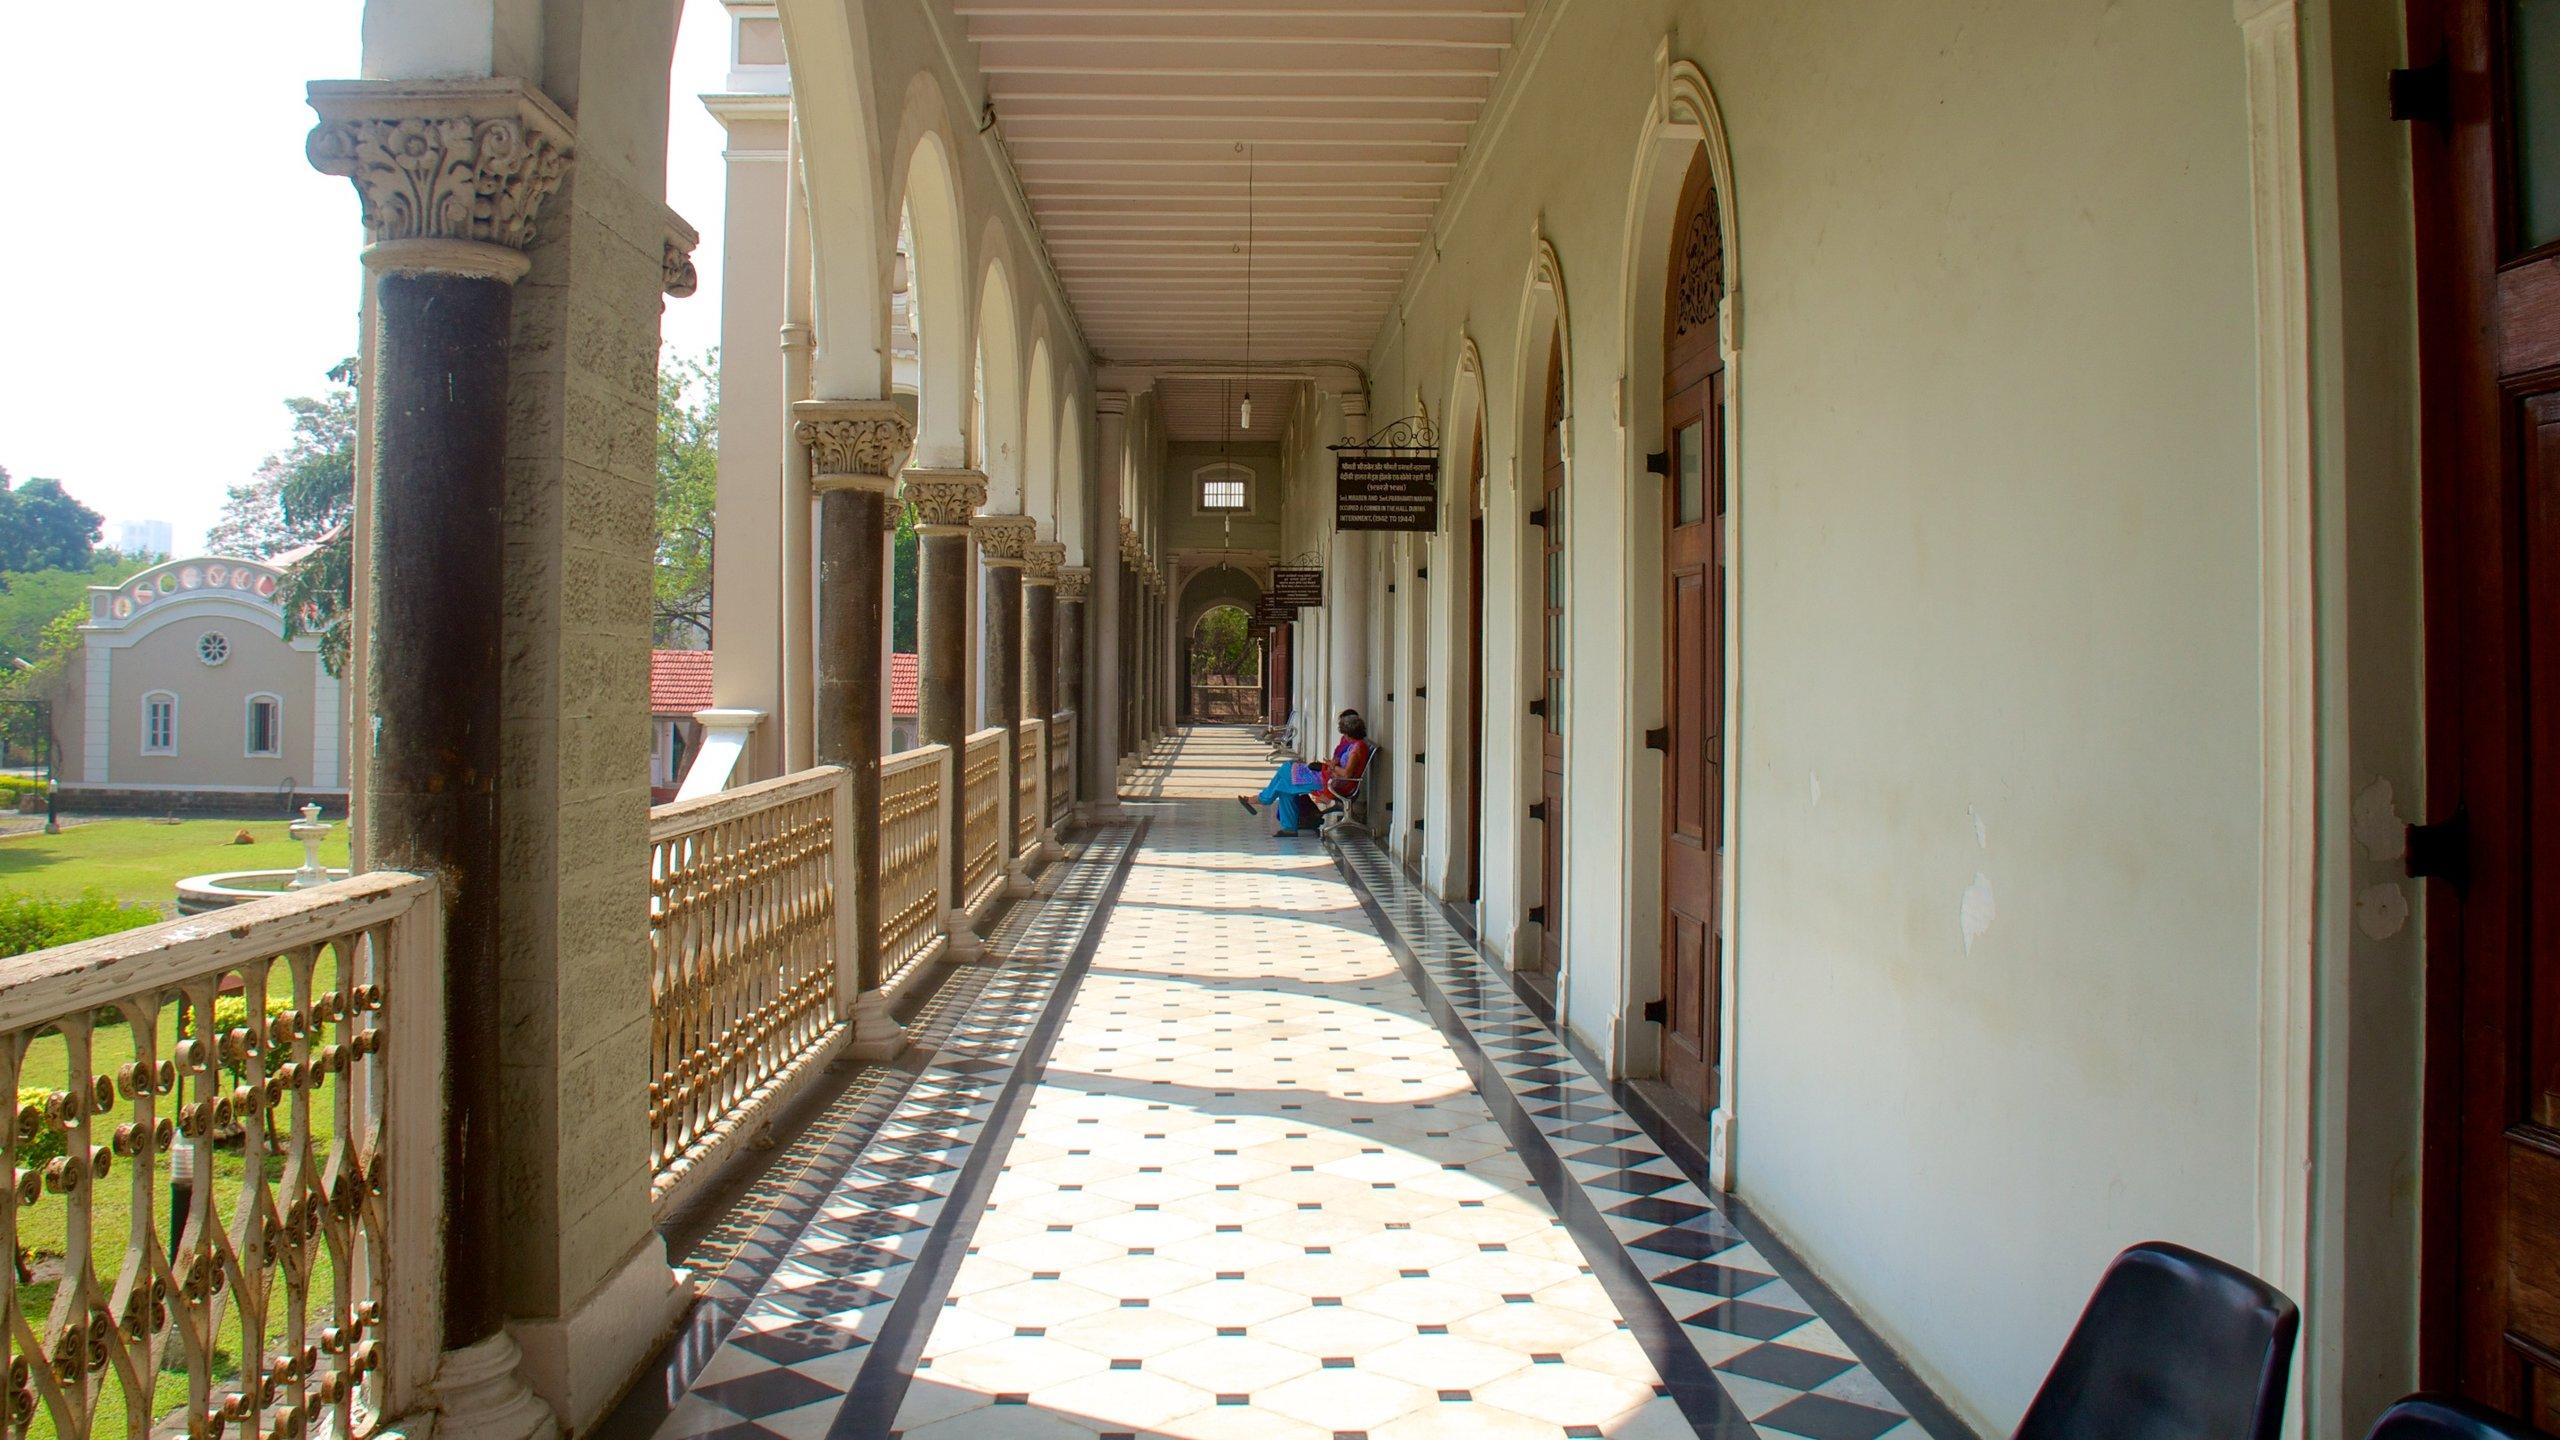 Pune District, Maharashtra, India